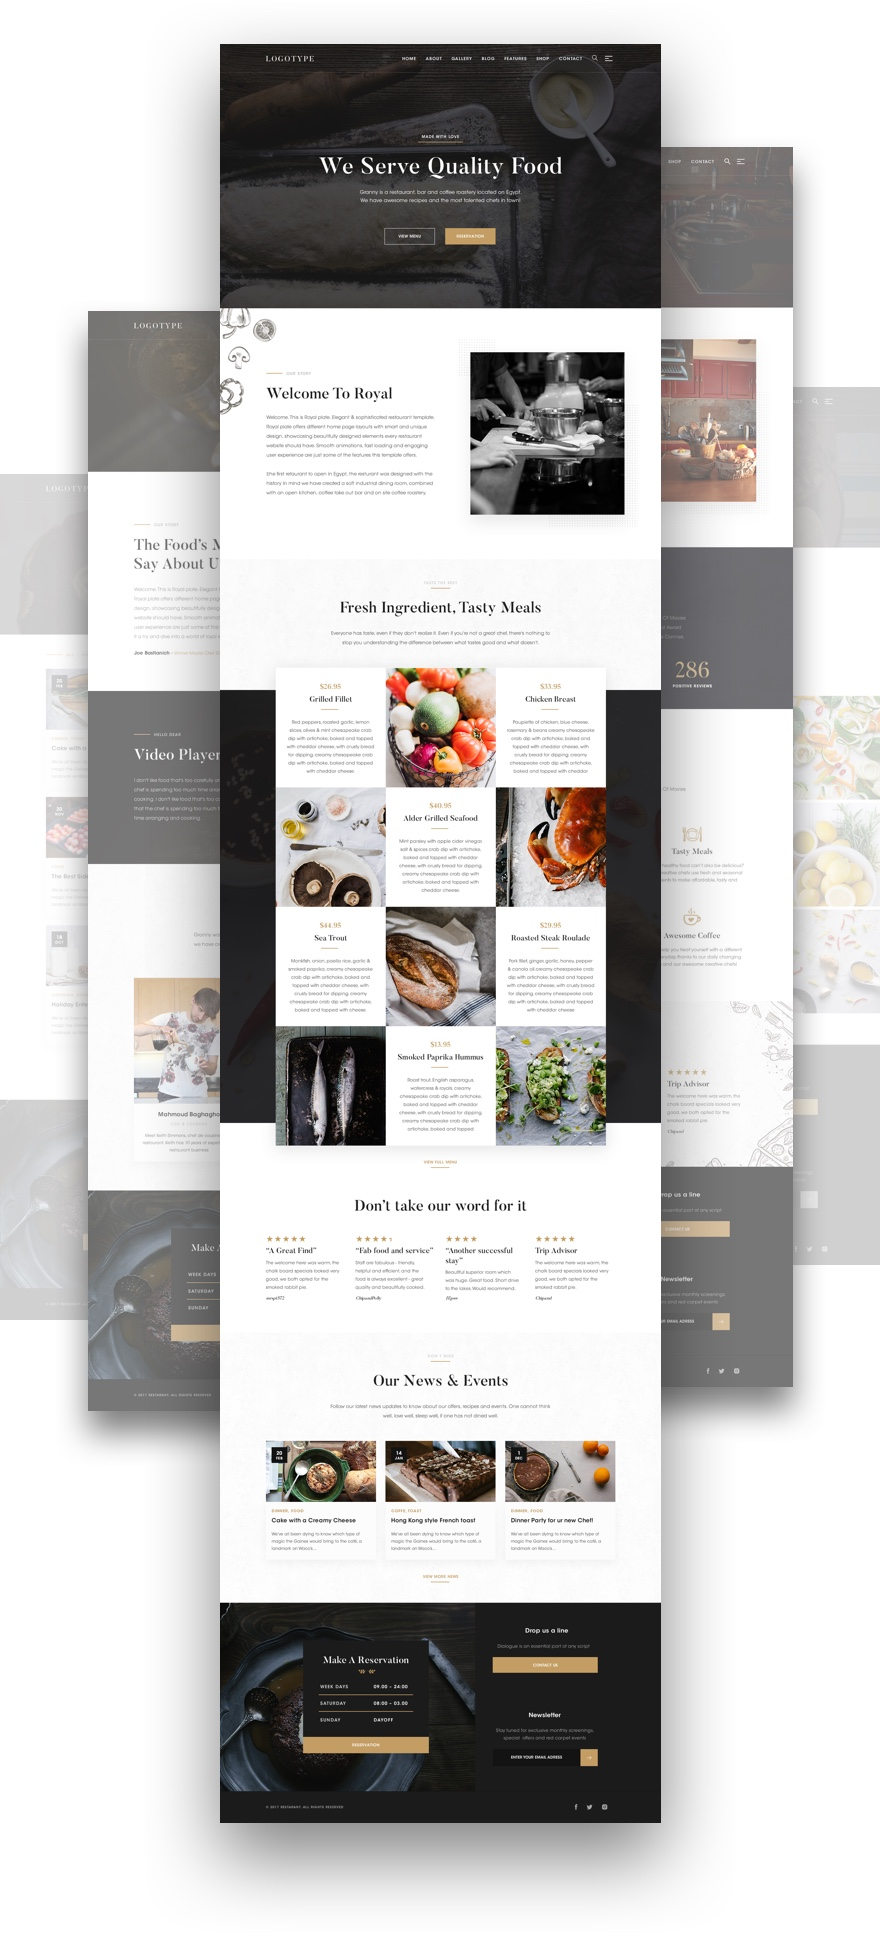 Descarga diseños de Divi gratis para tu web cada semana